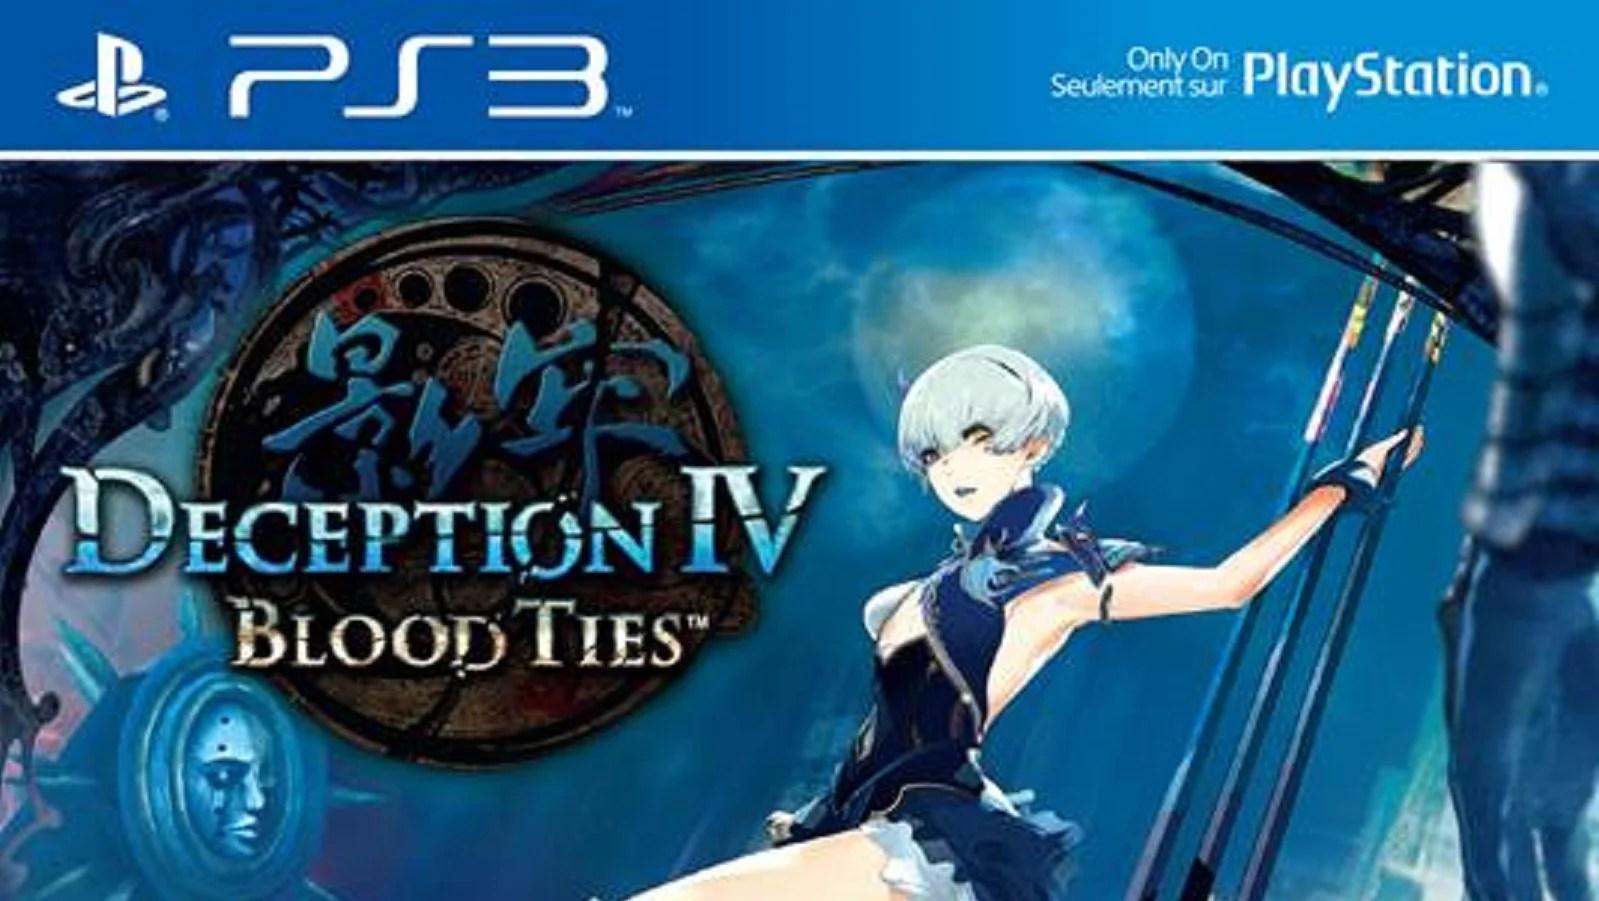 PS3 Game Box Art Will Soon Look Like PS4 Box Art